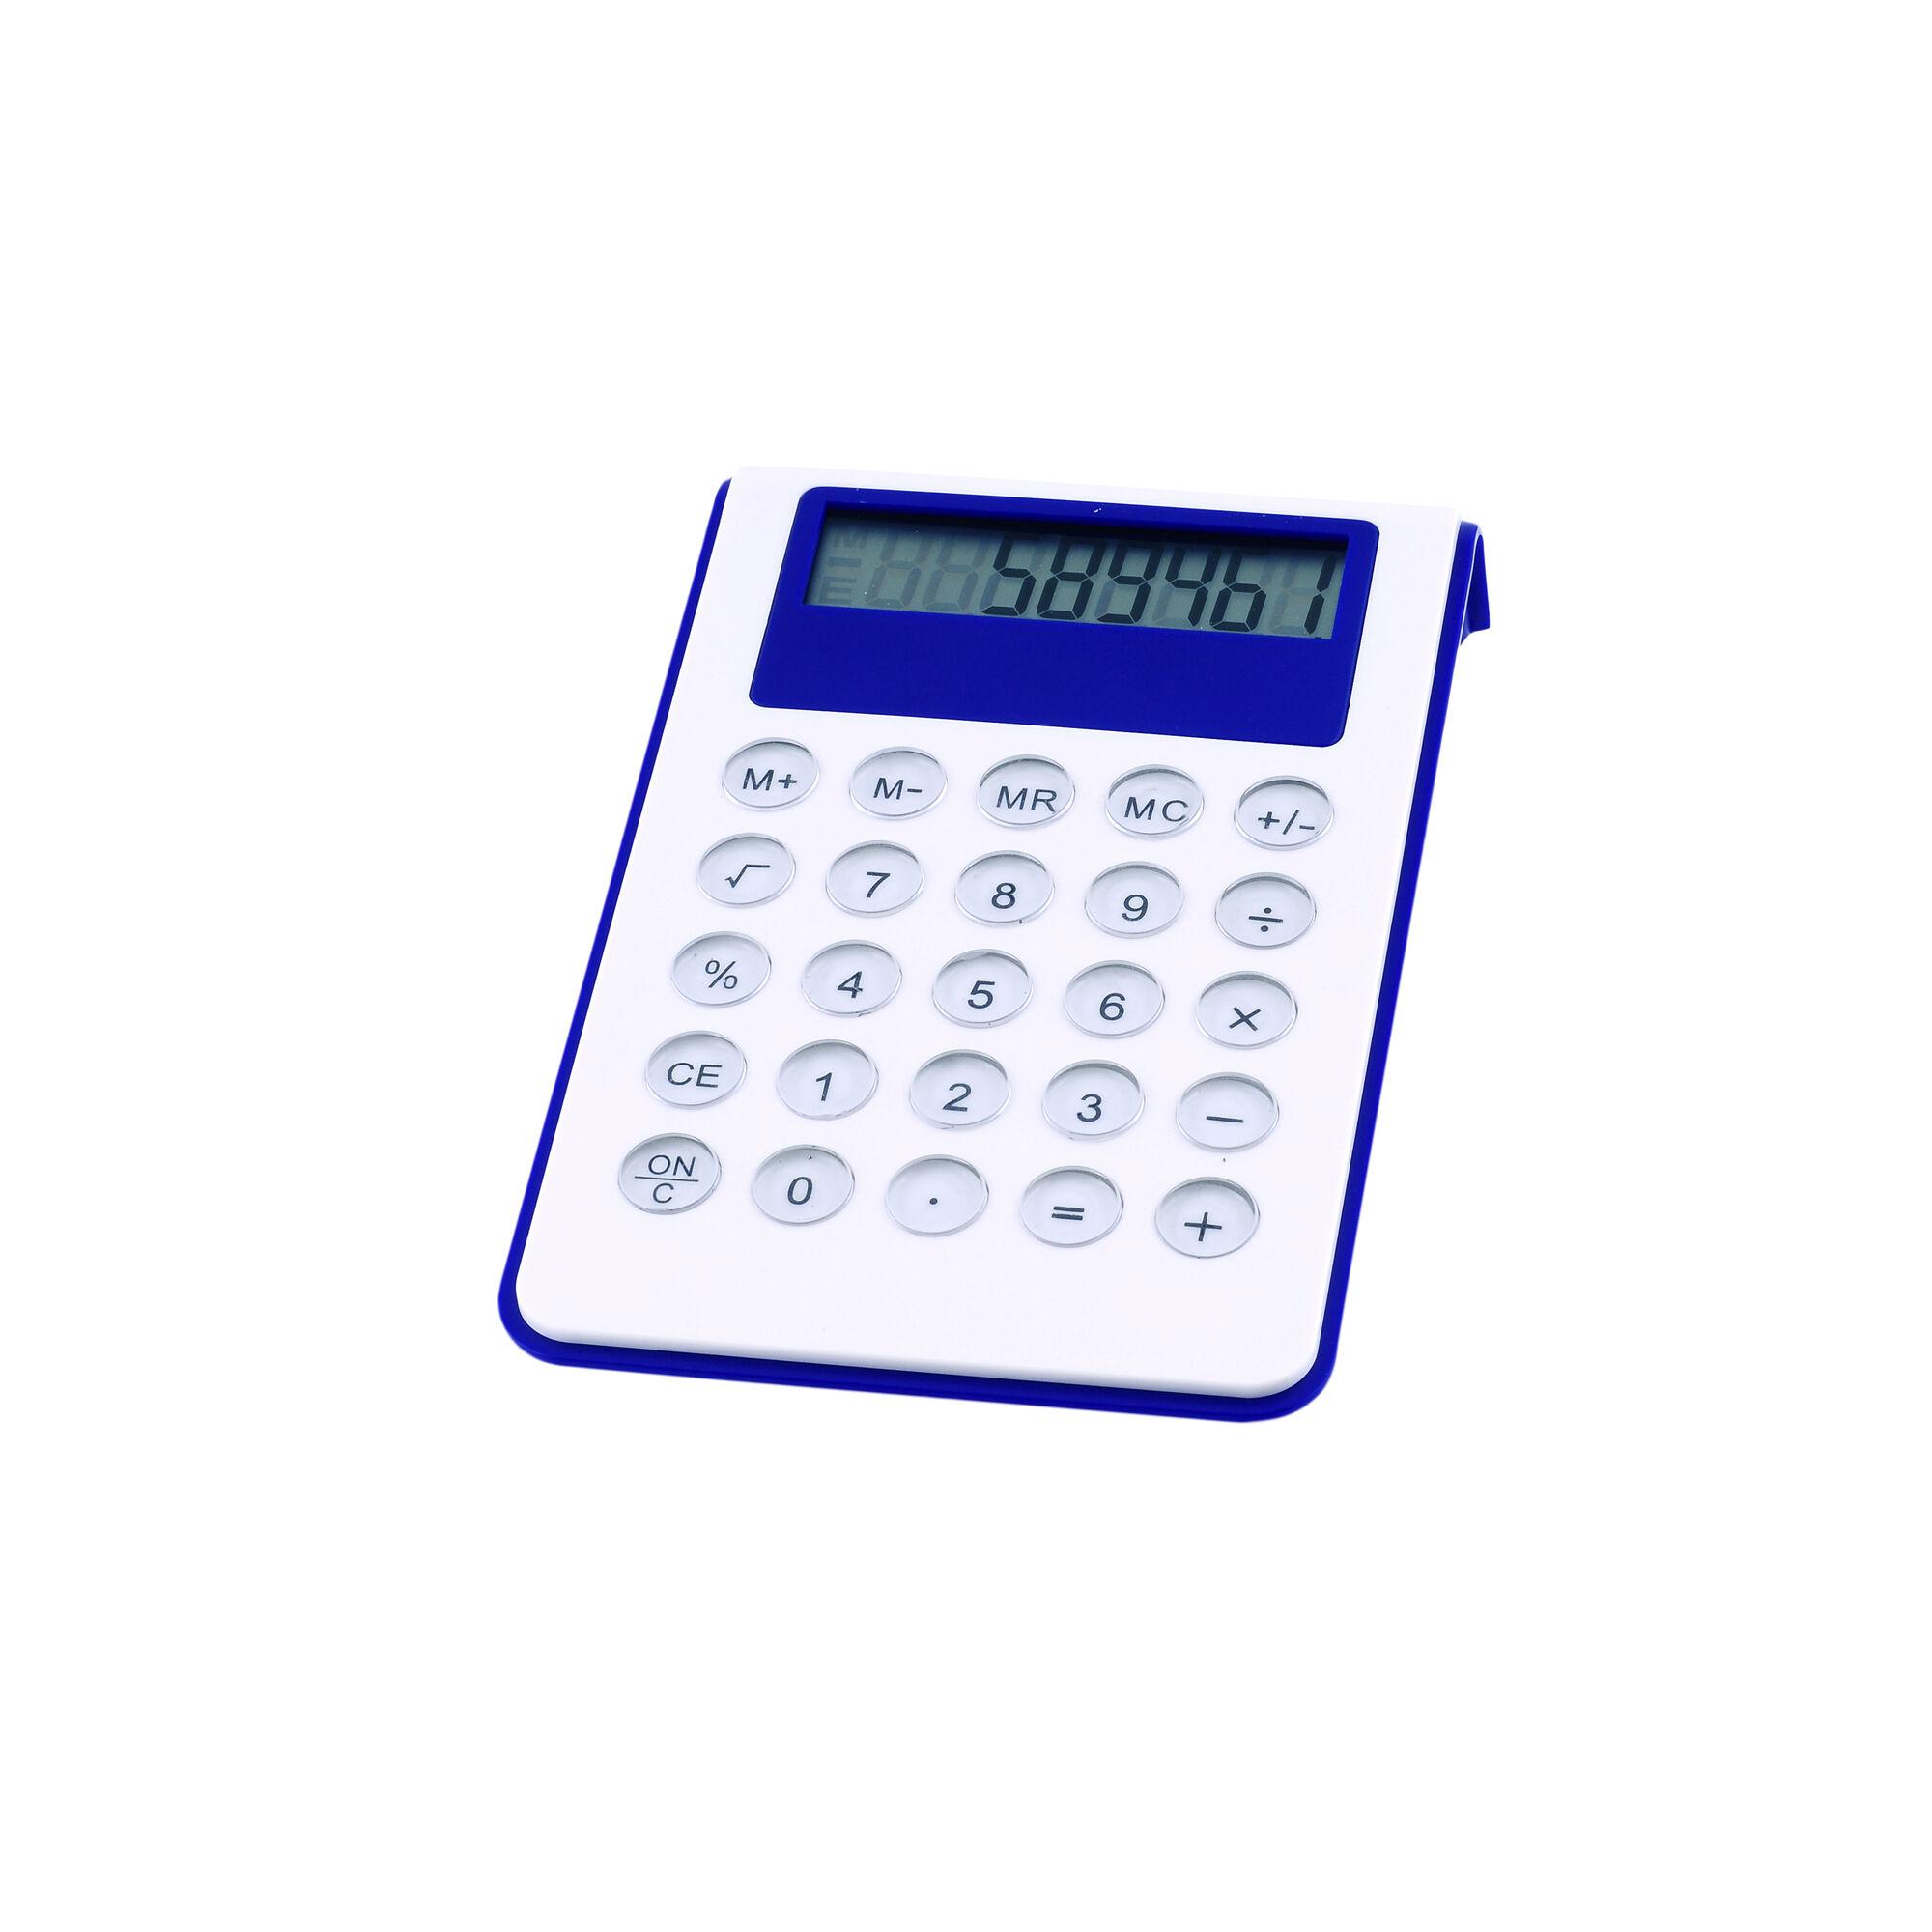 Calculator 8 Digit